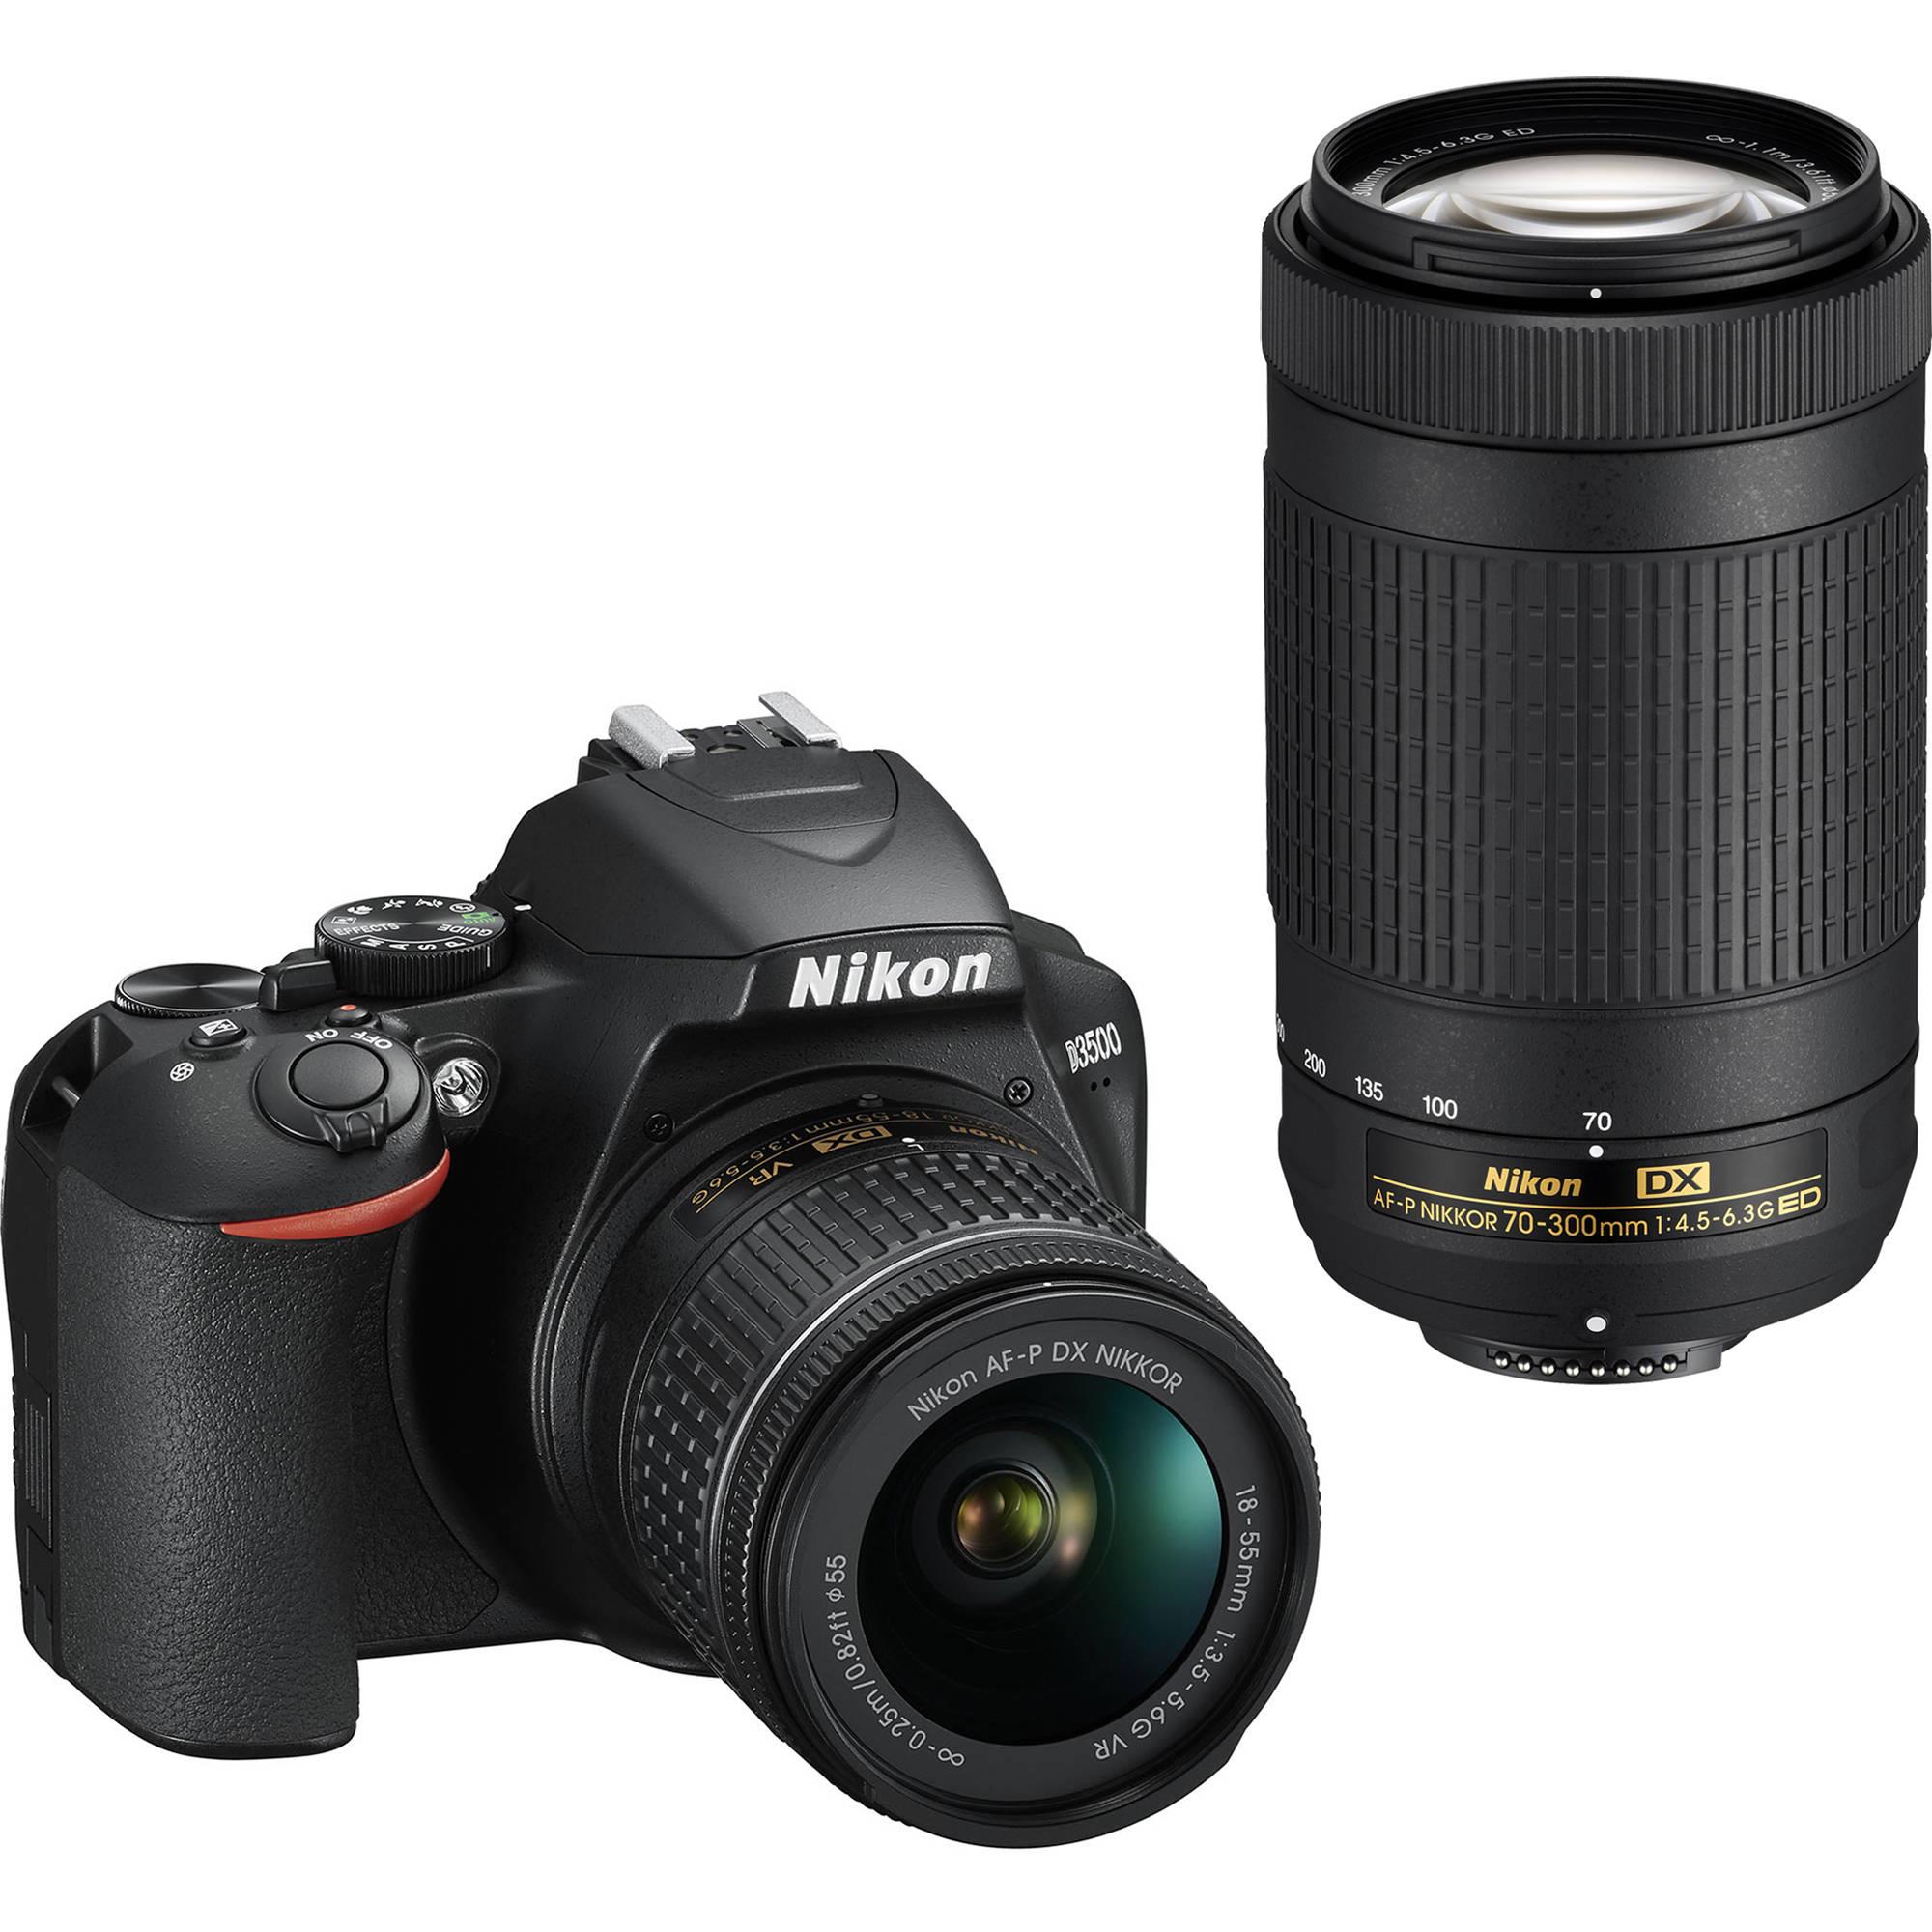 NIKON D3500 + 18-55 mm + 70-300 mm NON VR